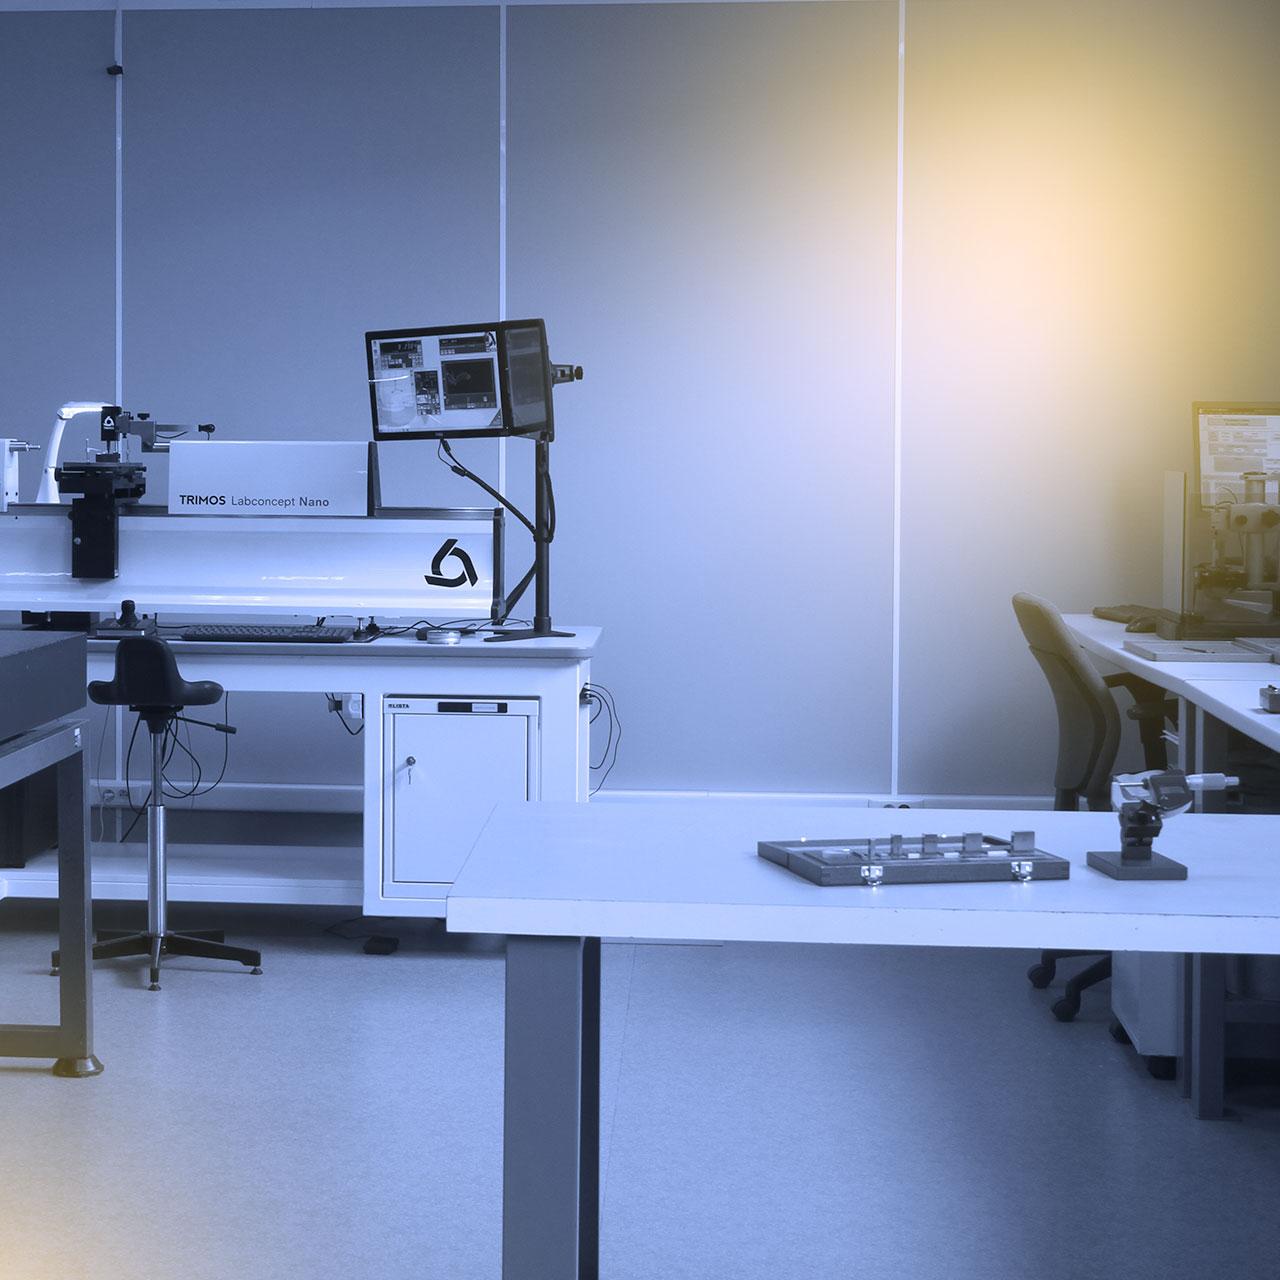 delta metrologie laboratoire metrologie haute savoie cluses - Maintenance